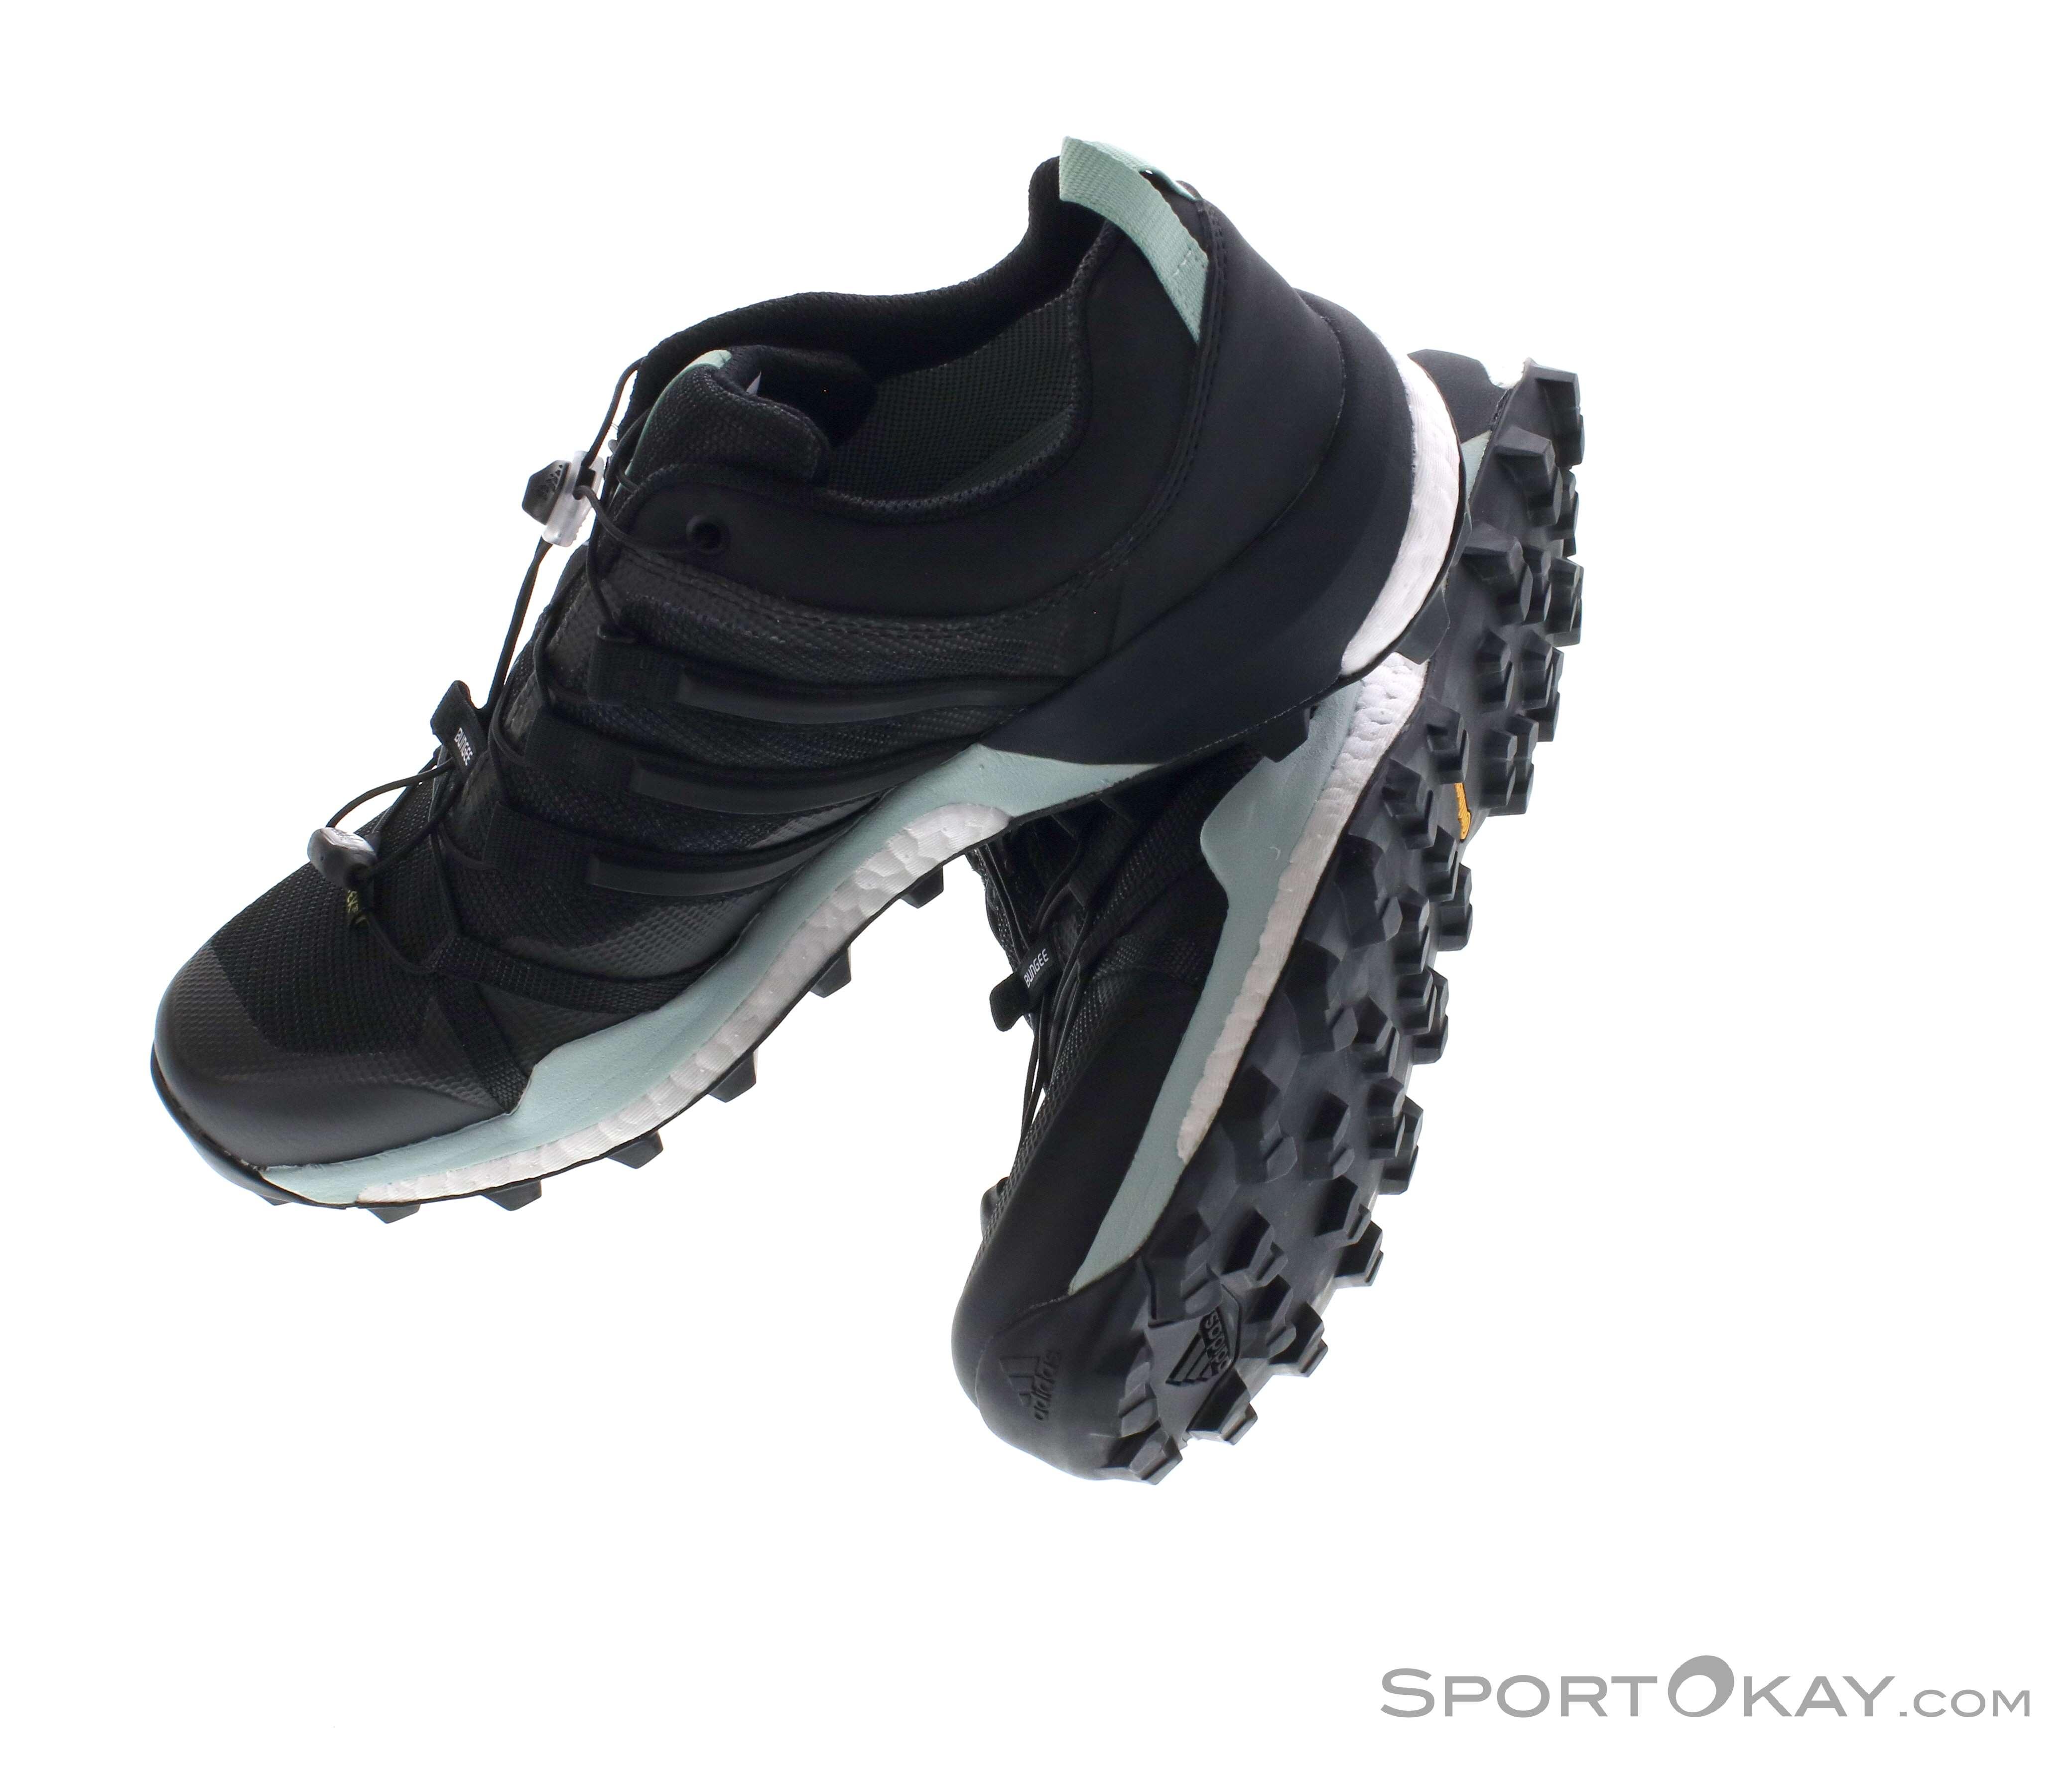 quality design c1b04 22188 adidas Terrex Skychaser GTX Damen Traillaufschuhe Gore-Tex, adidas, Schwarz,  , Damen